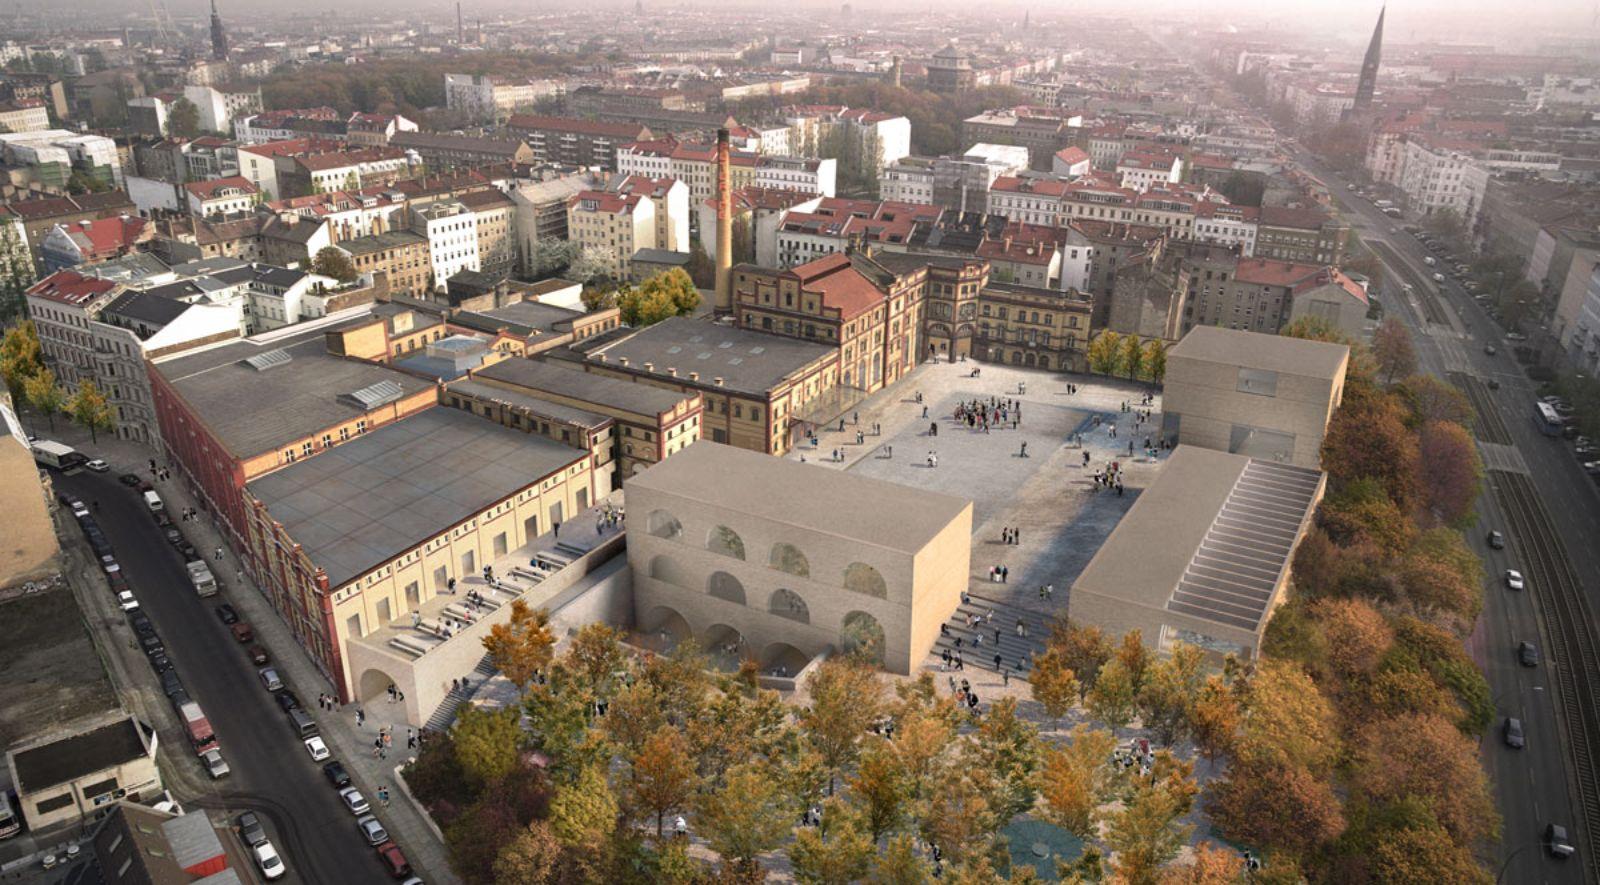 Bötzow Brewery